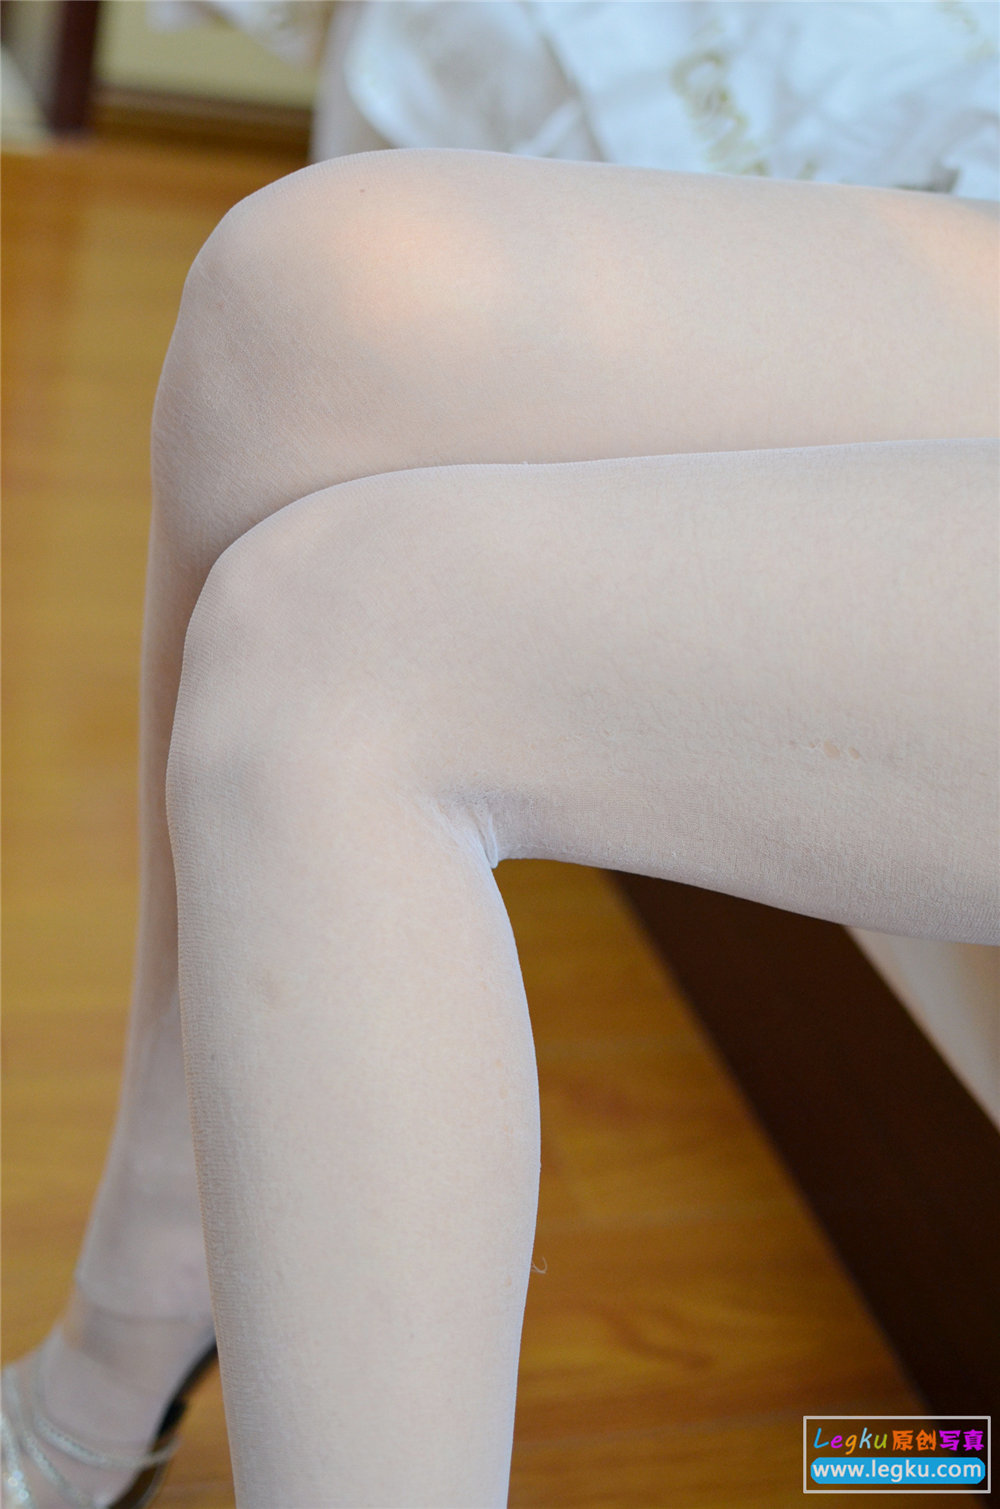 [Legku原创写真] NO.101-110 10期打包合集丝袜玉足美腿高清大图百度云下载